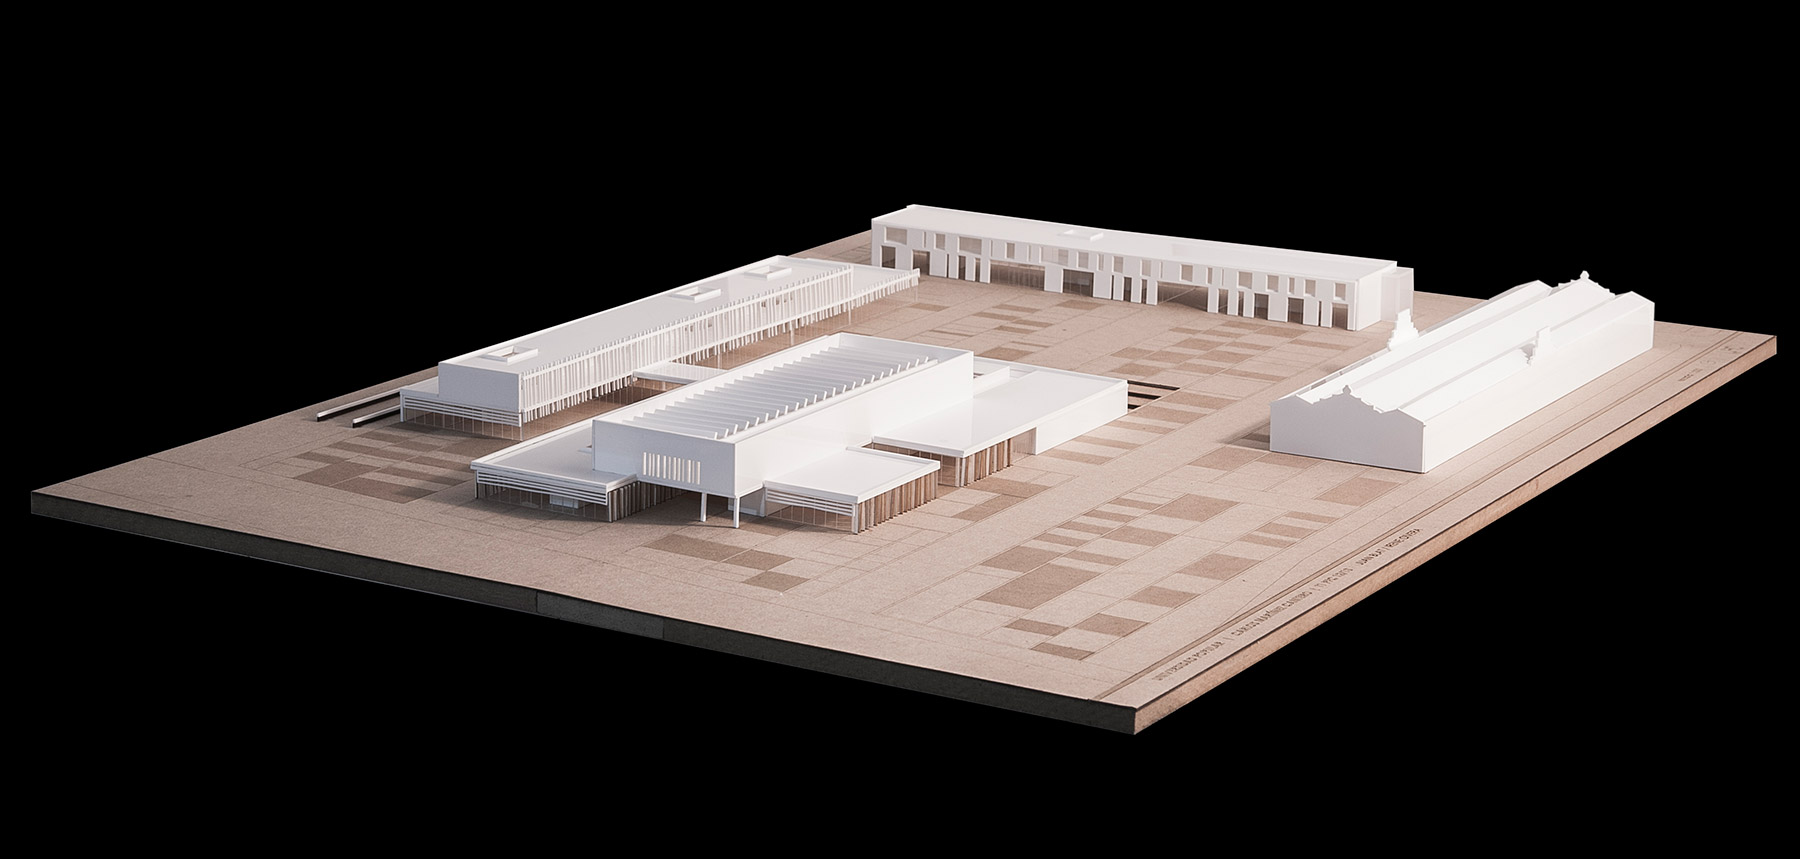 maqueta-arquitectura-architecture model-pfc-etsav-upv-Universidad-Popular-Valencia (1)